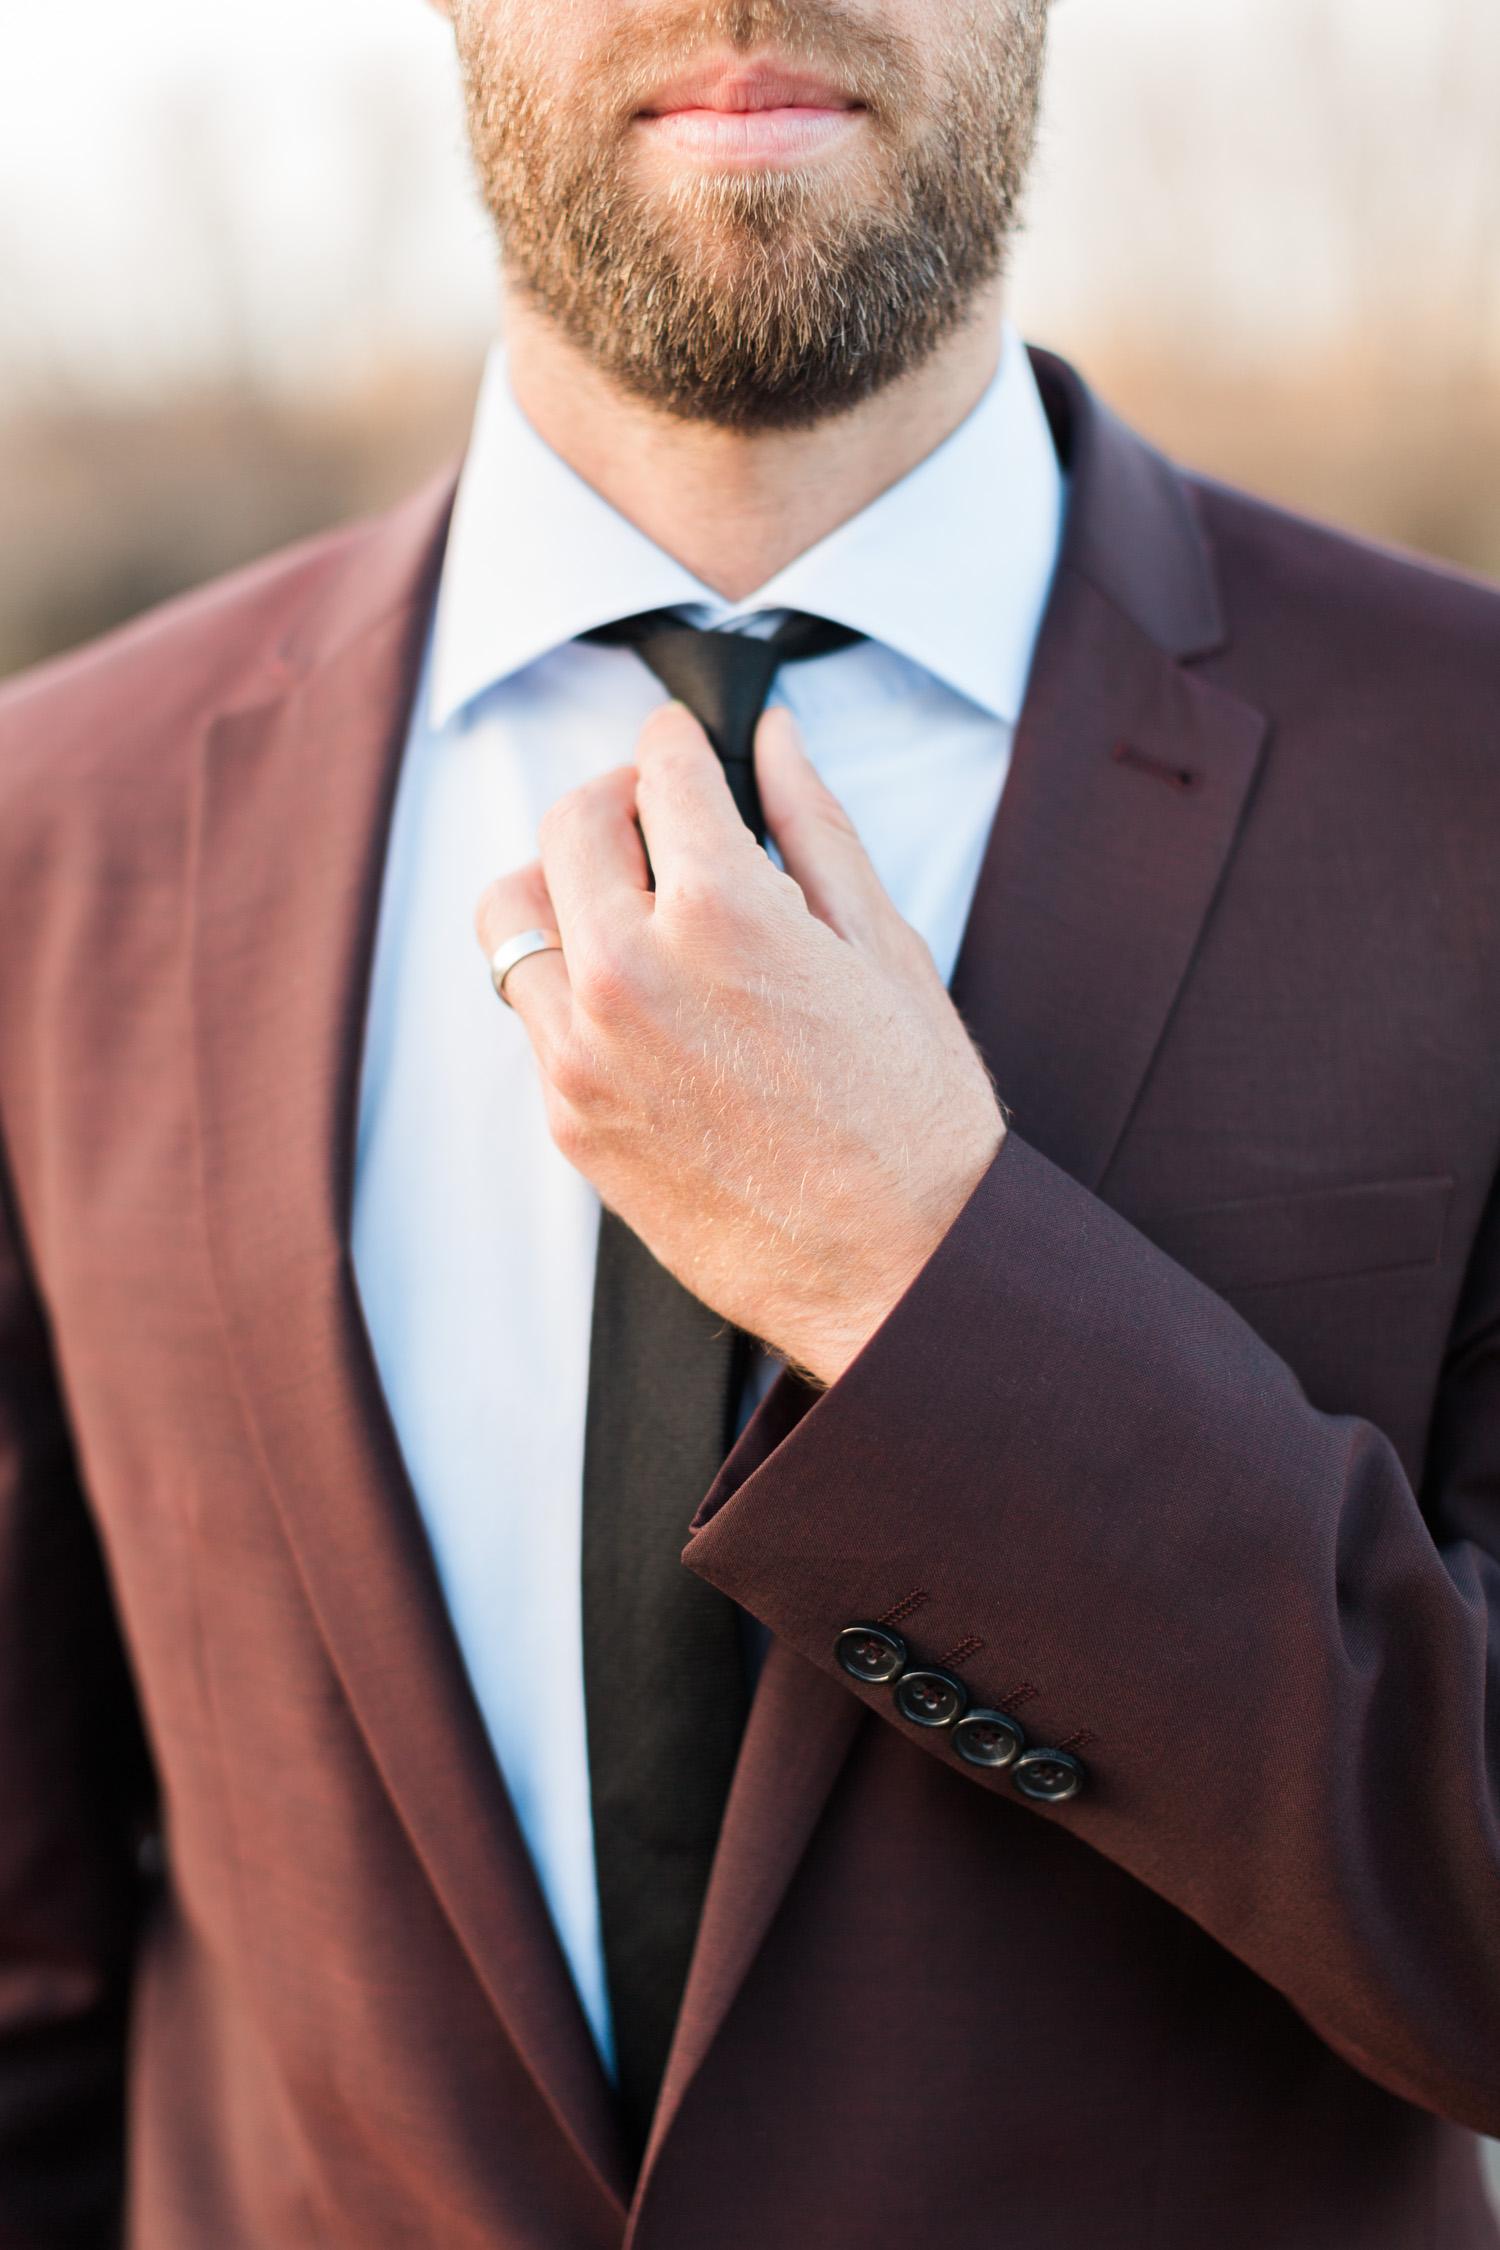 Straightening his tie, wearing a classy burgundy jacket.